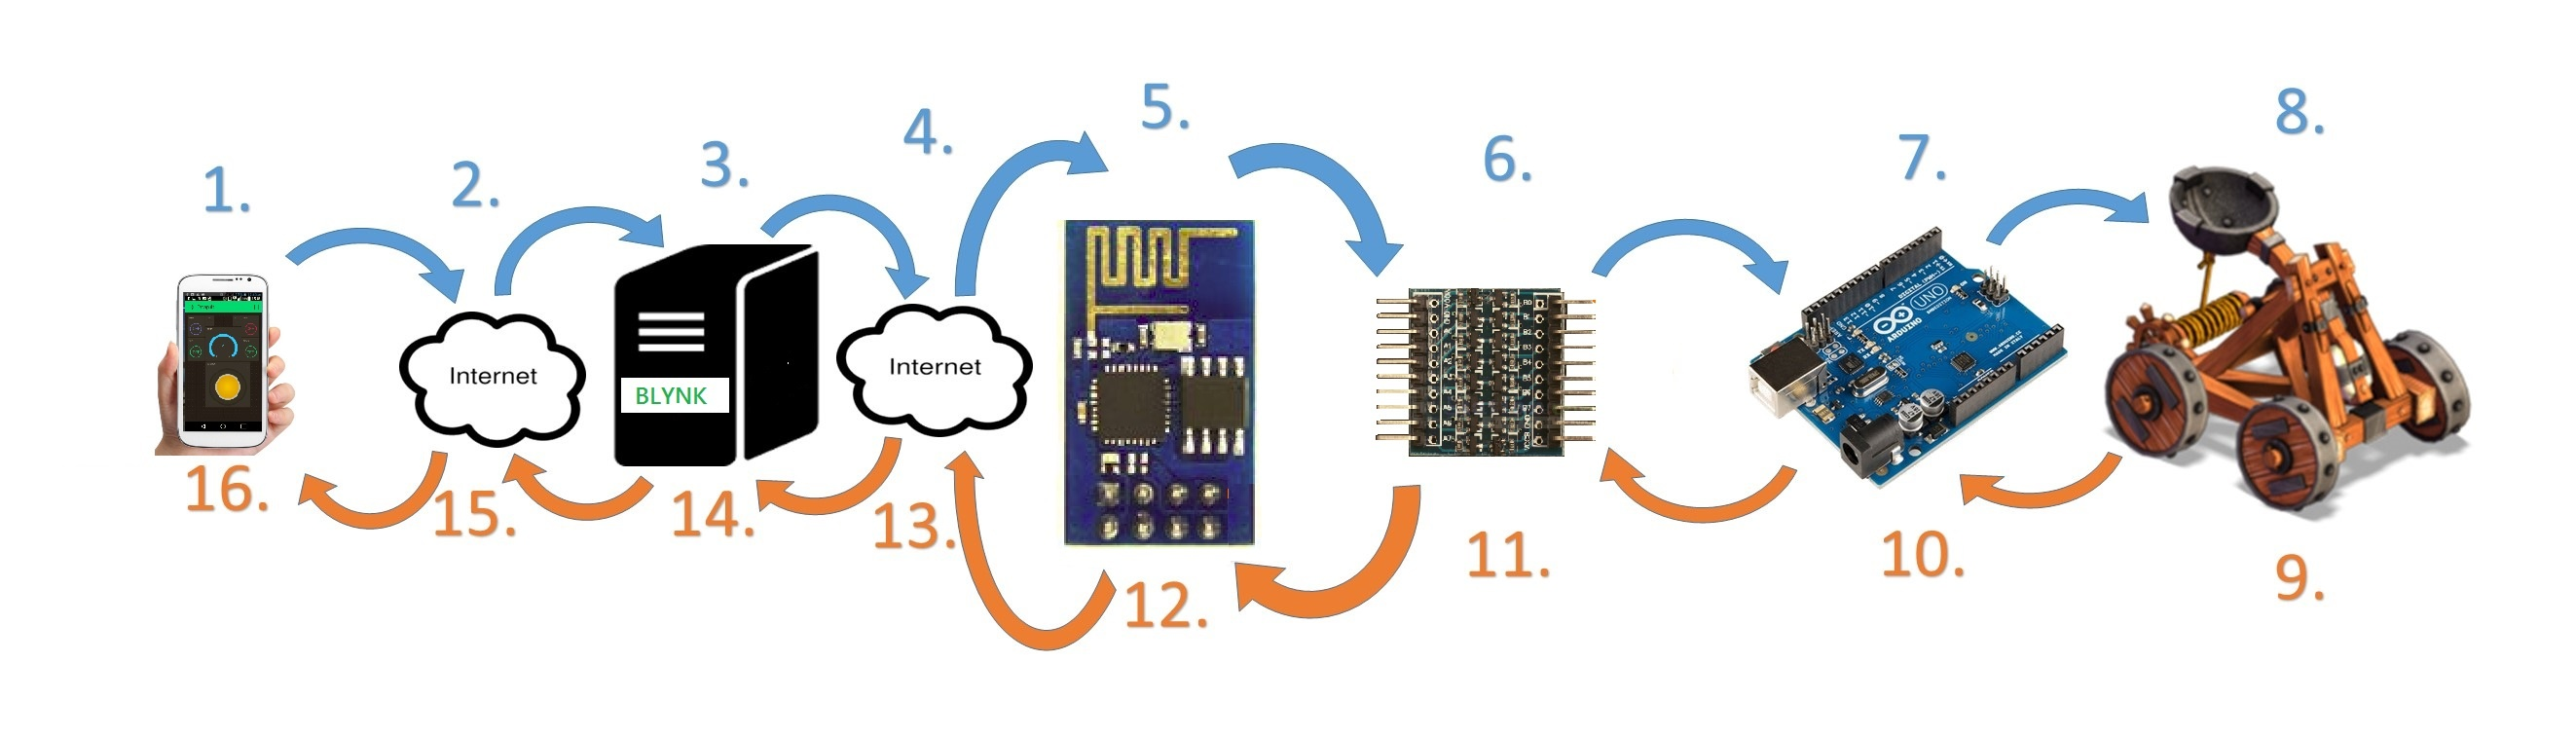 Iot Catapult Mechatronics Exercises Aalto University Wiki Engineering Schematics Jpeg File